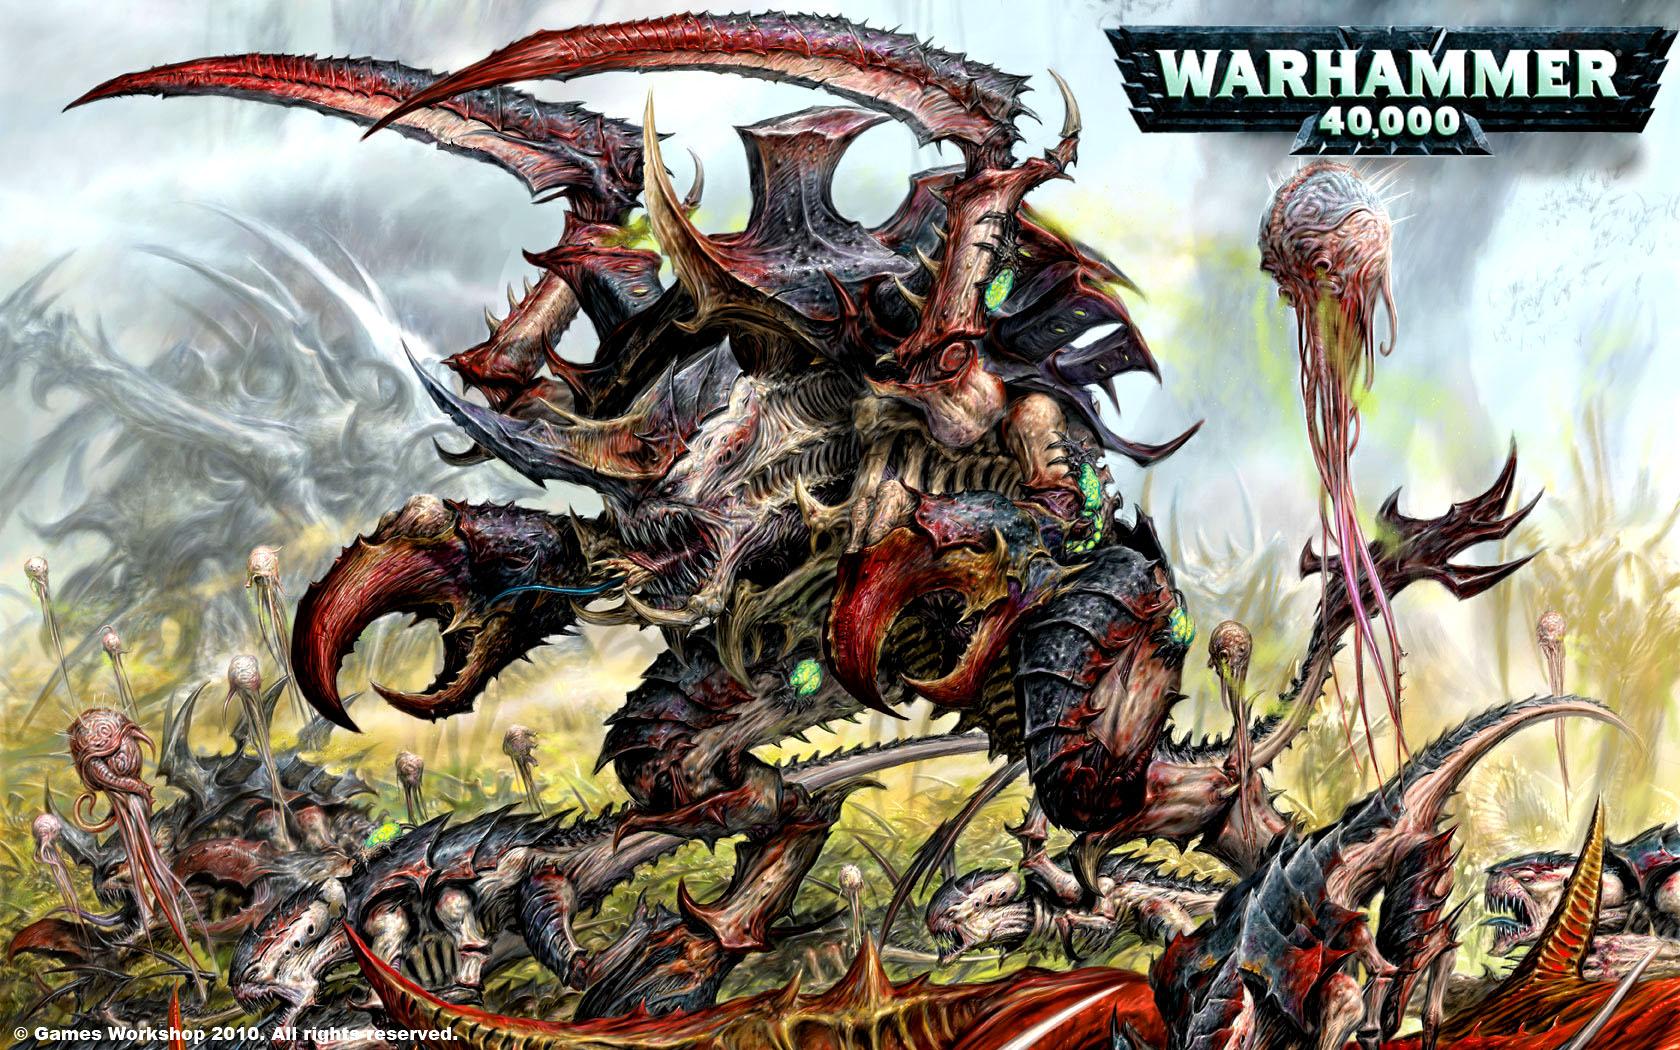 alien vs predator wallpaper 1080p